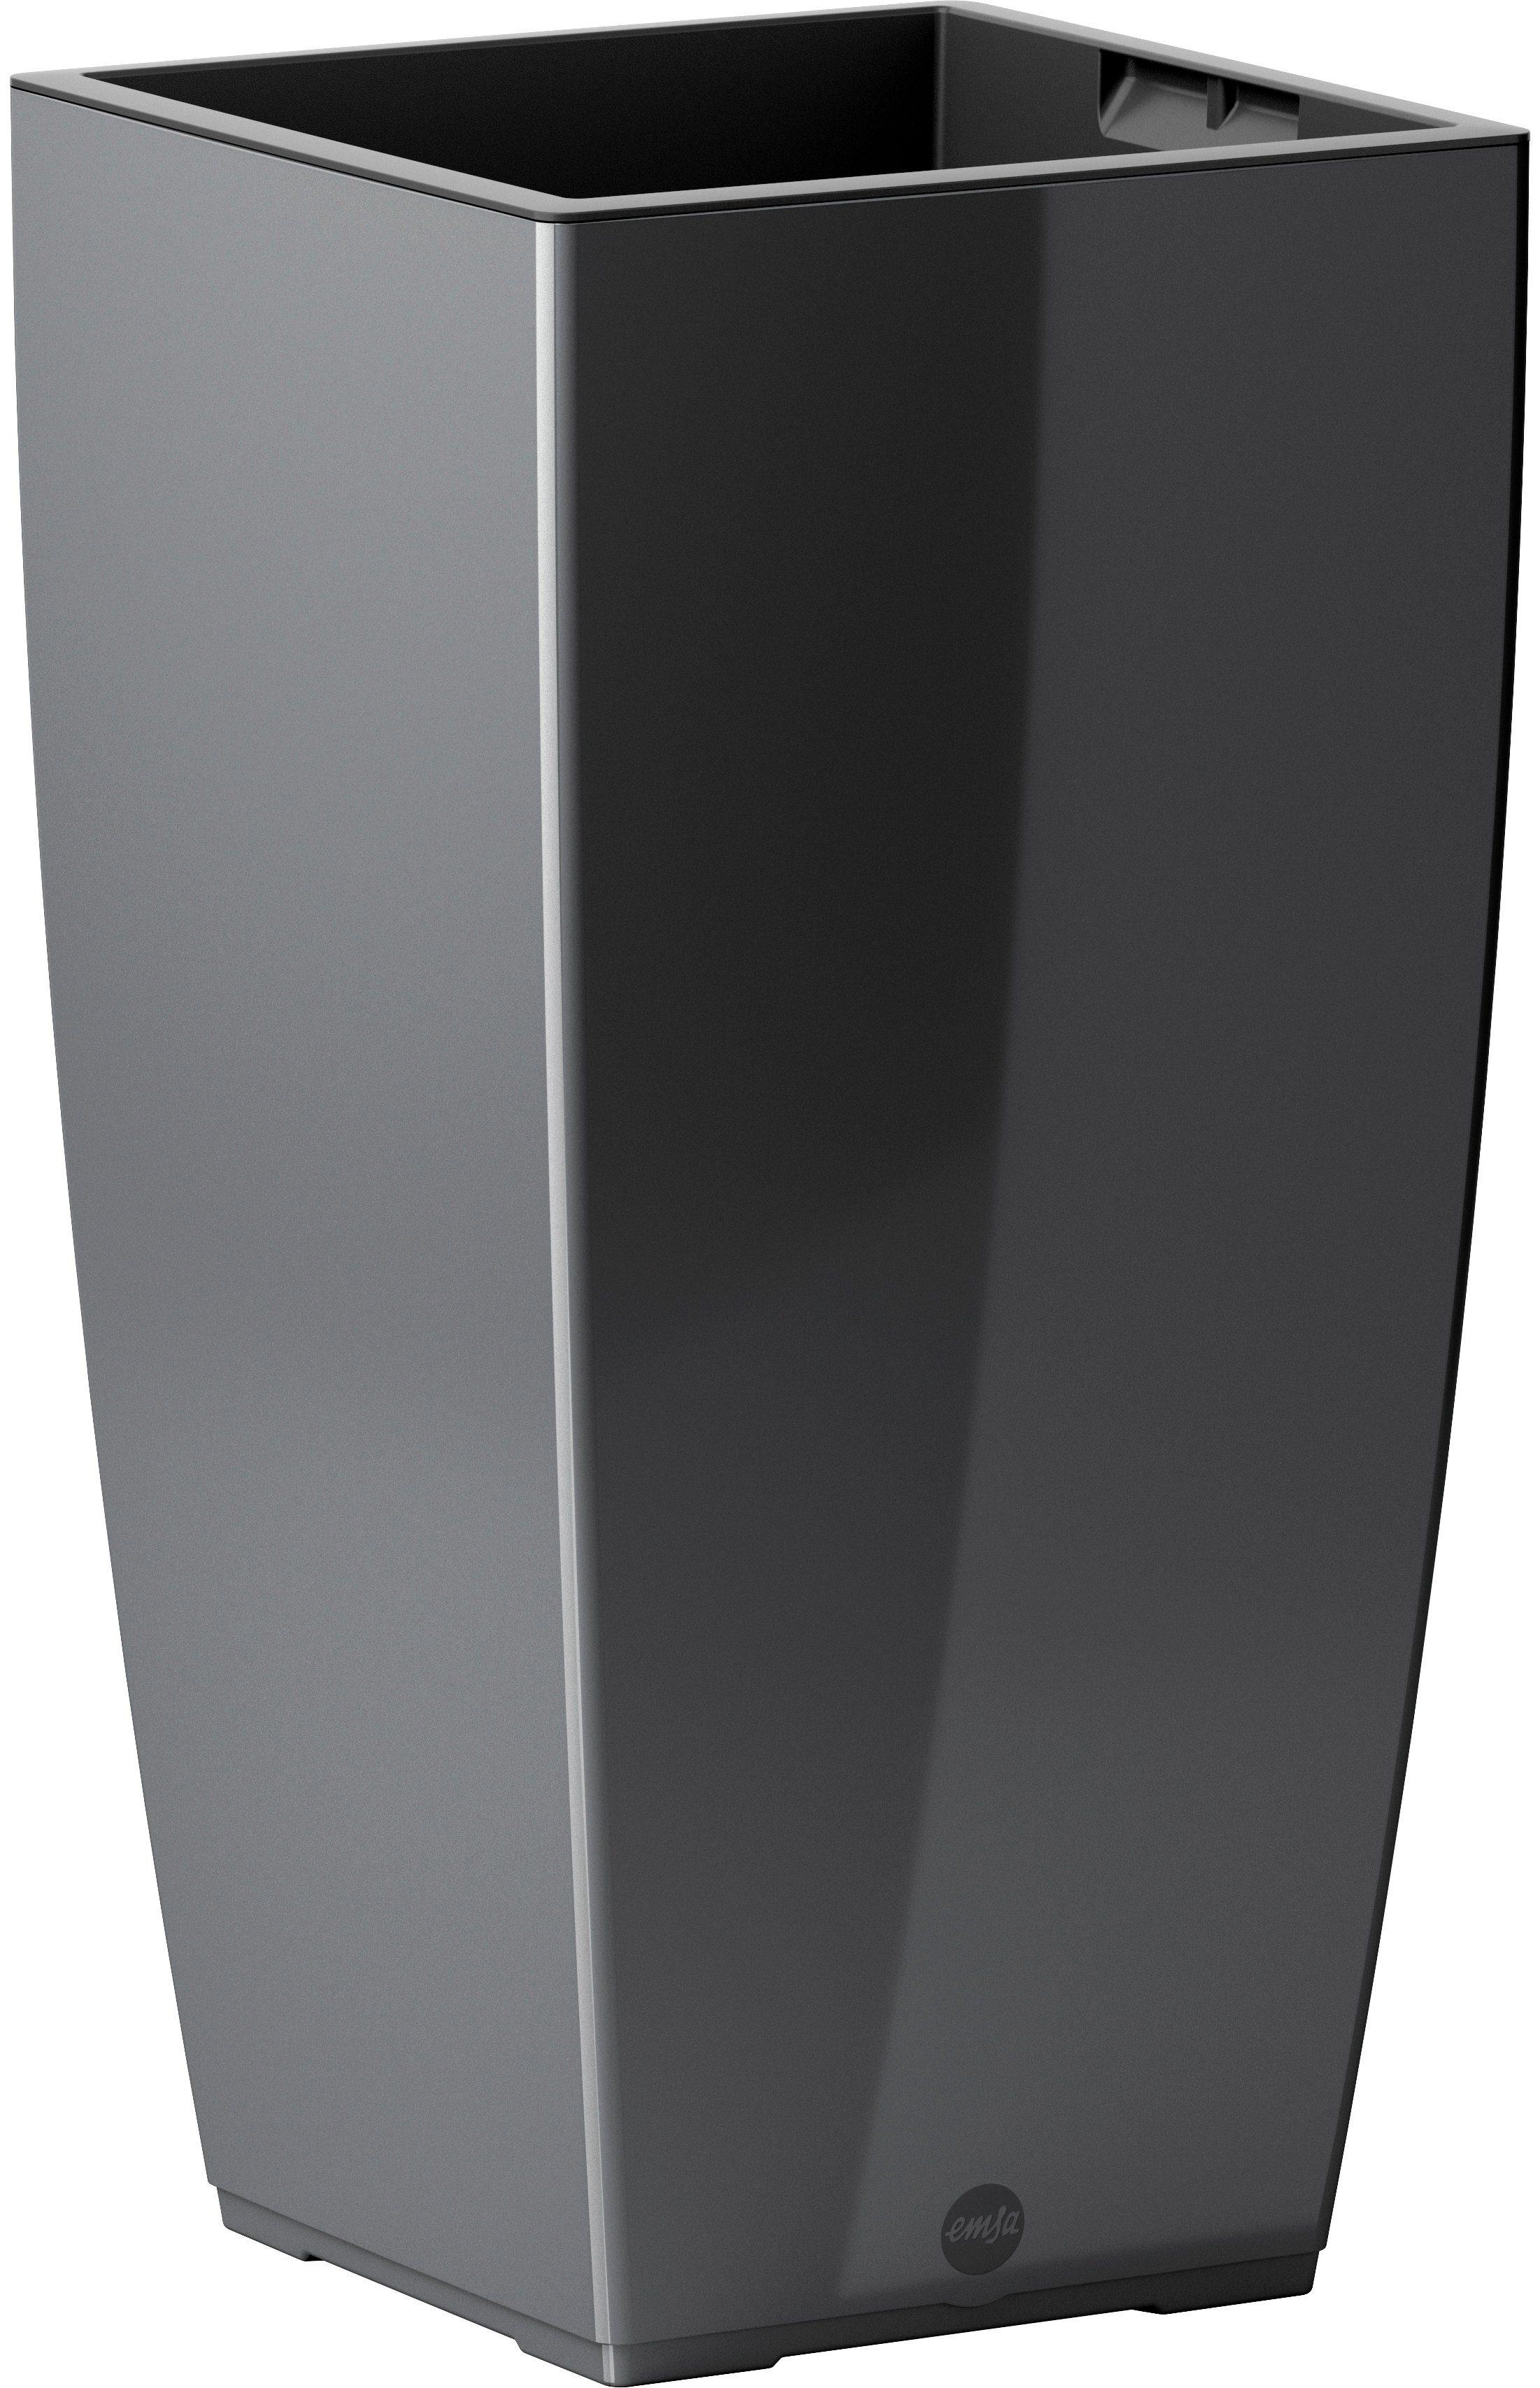 Blumenkasten »CASA Brilliant Säule«, BxTxH: 30x30x57 cm, granit